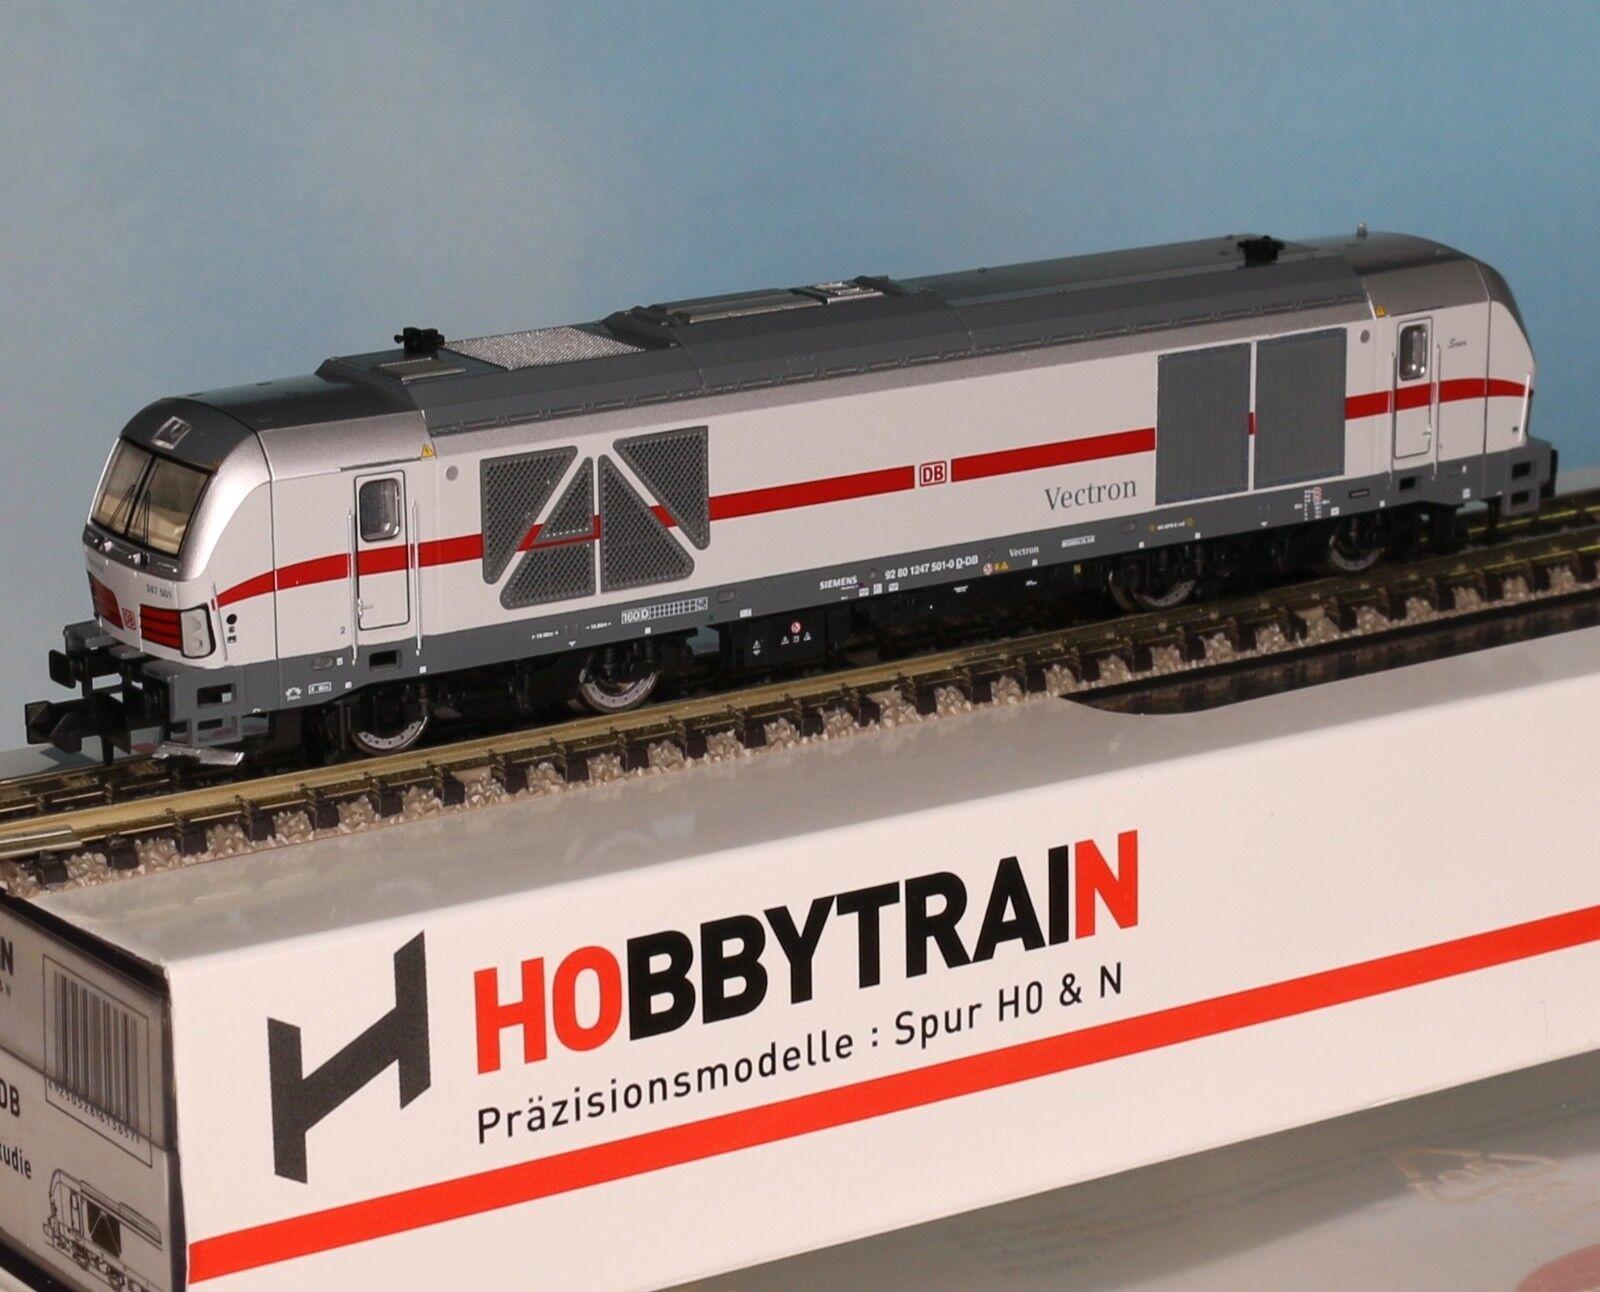 Hobbytrain 3106, Traccia N, Diesel BR 247 IC design, ep. 6, Hobbytrain 3106